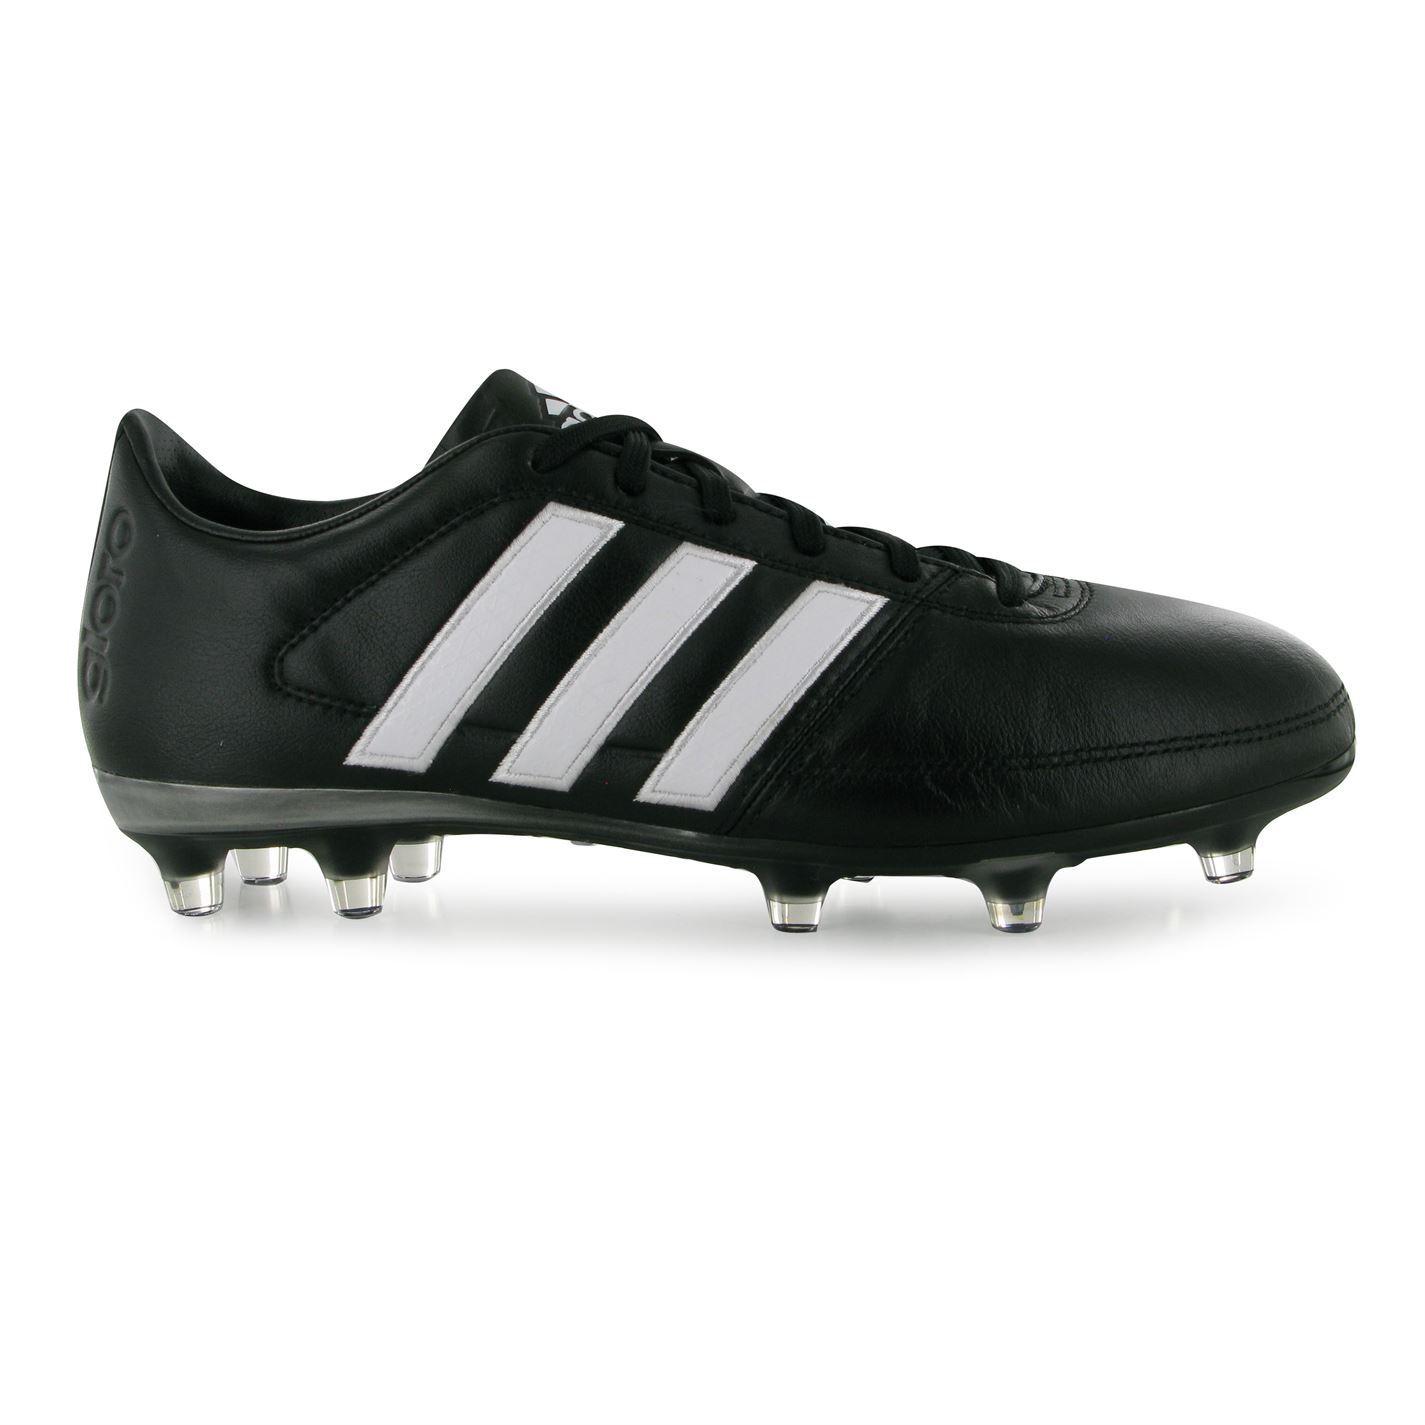 a6cd0d3724d4 ... Adidas Gloro 16.1 FG Firm Ground Football Boots Mens Black White Soccer  Cleats ...